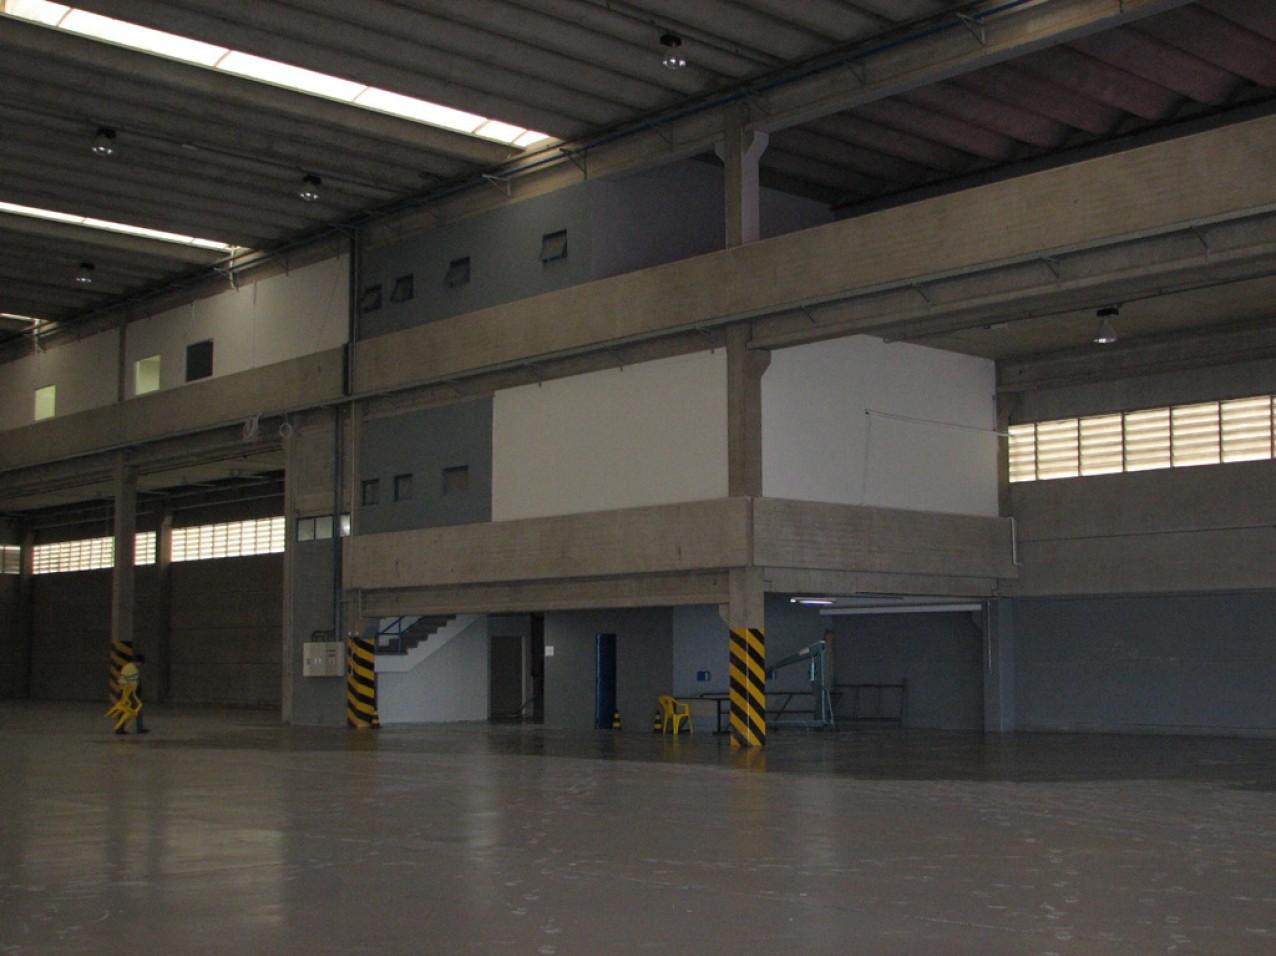 Obra industrial Alestis Aerospace - Fabrica de montagem